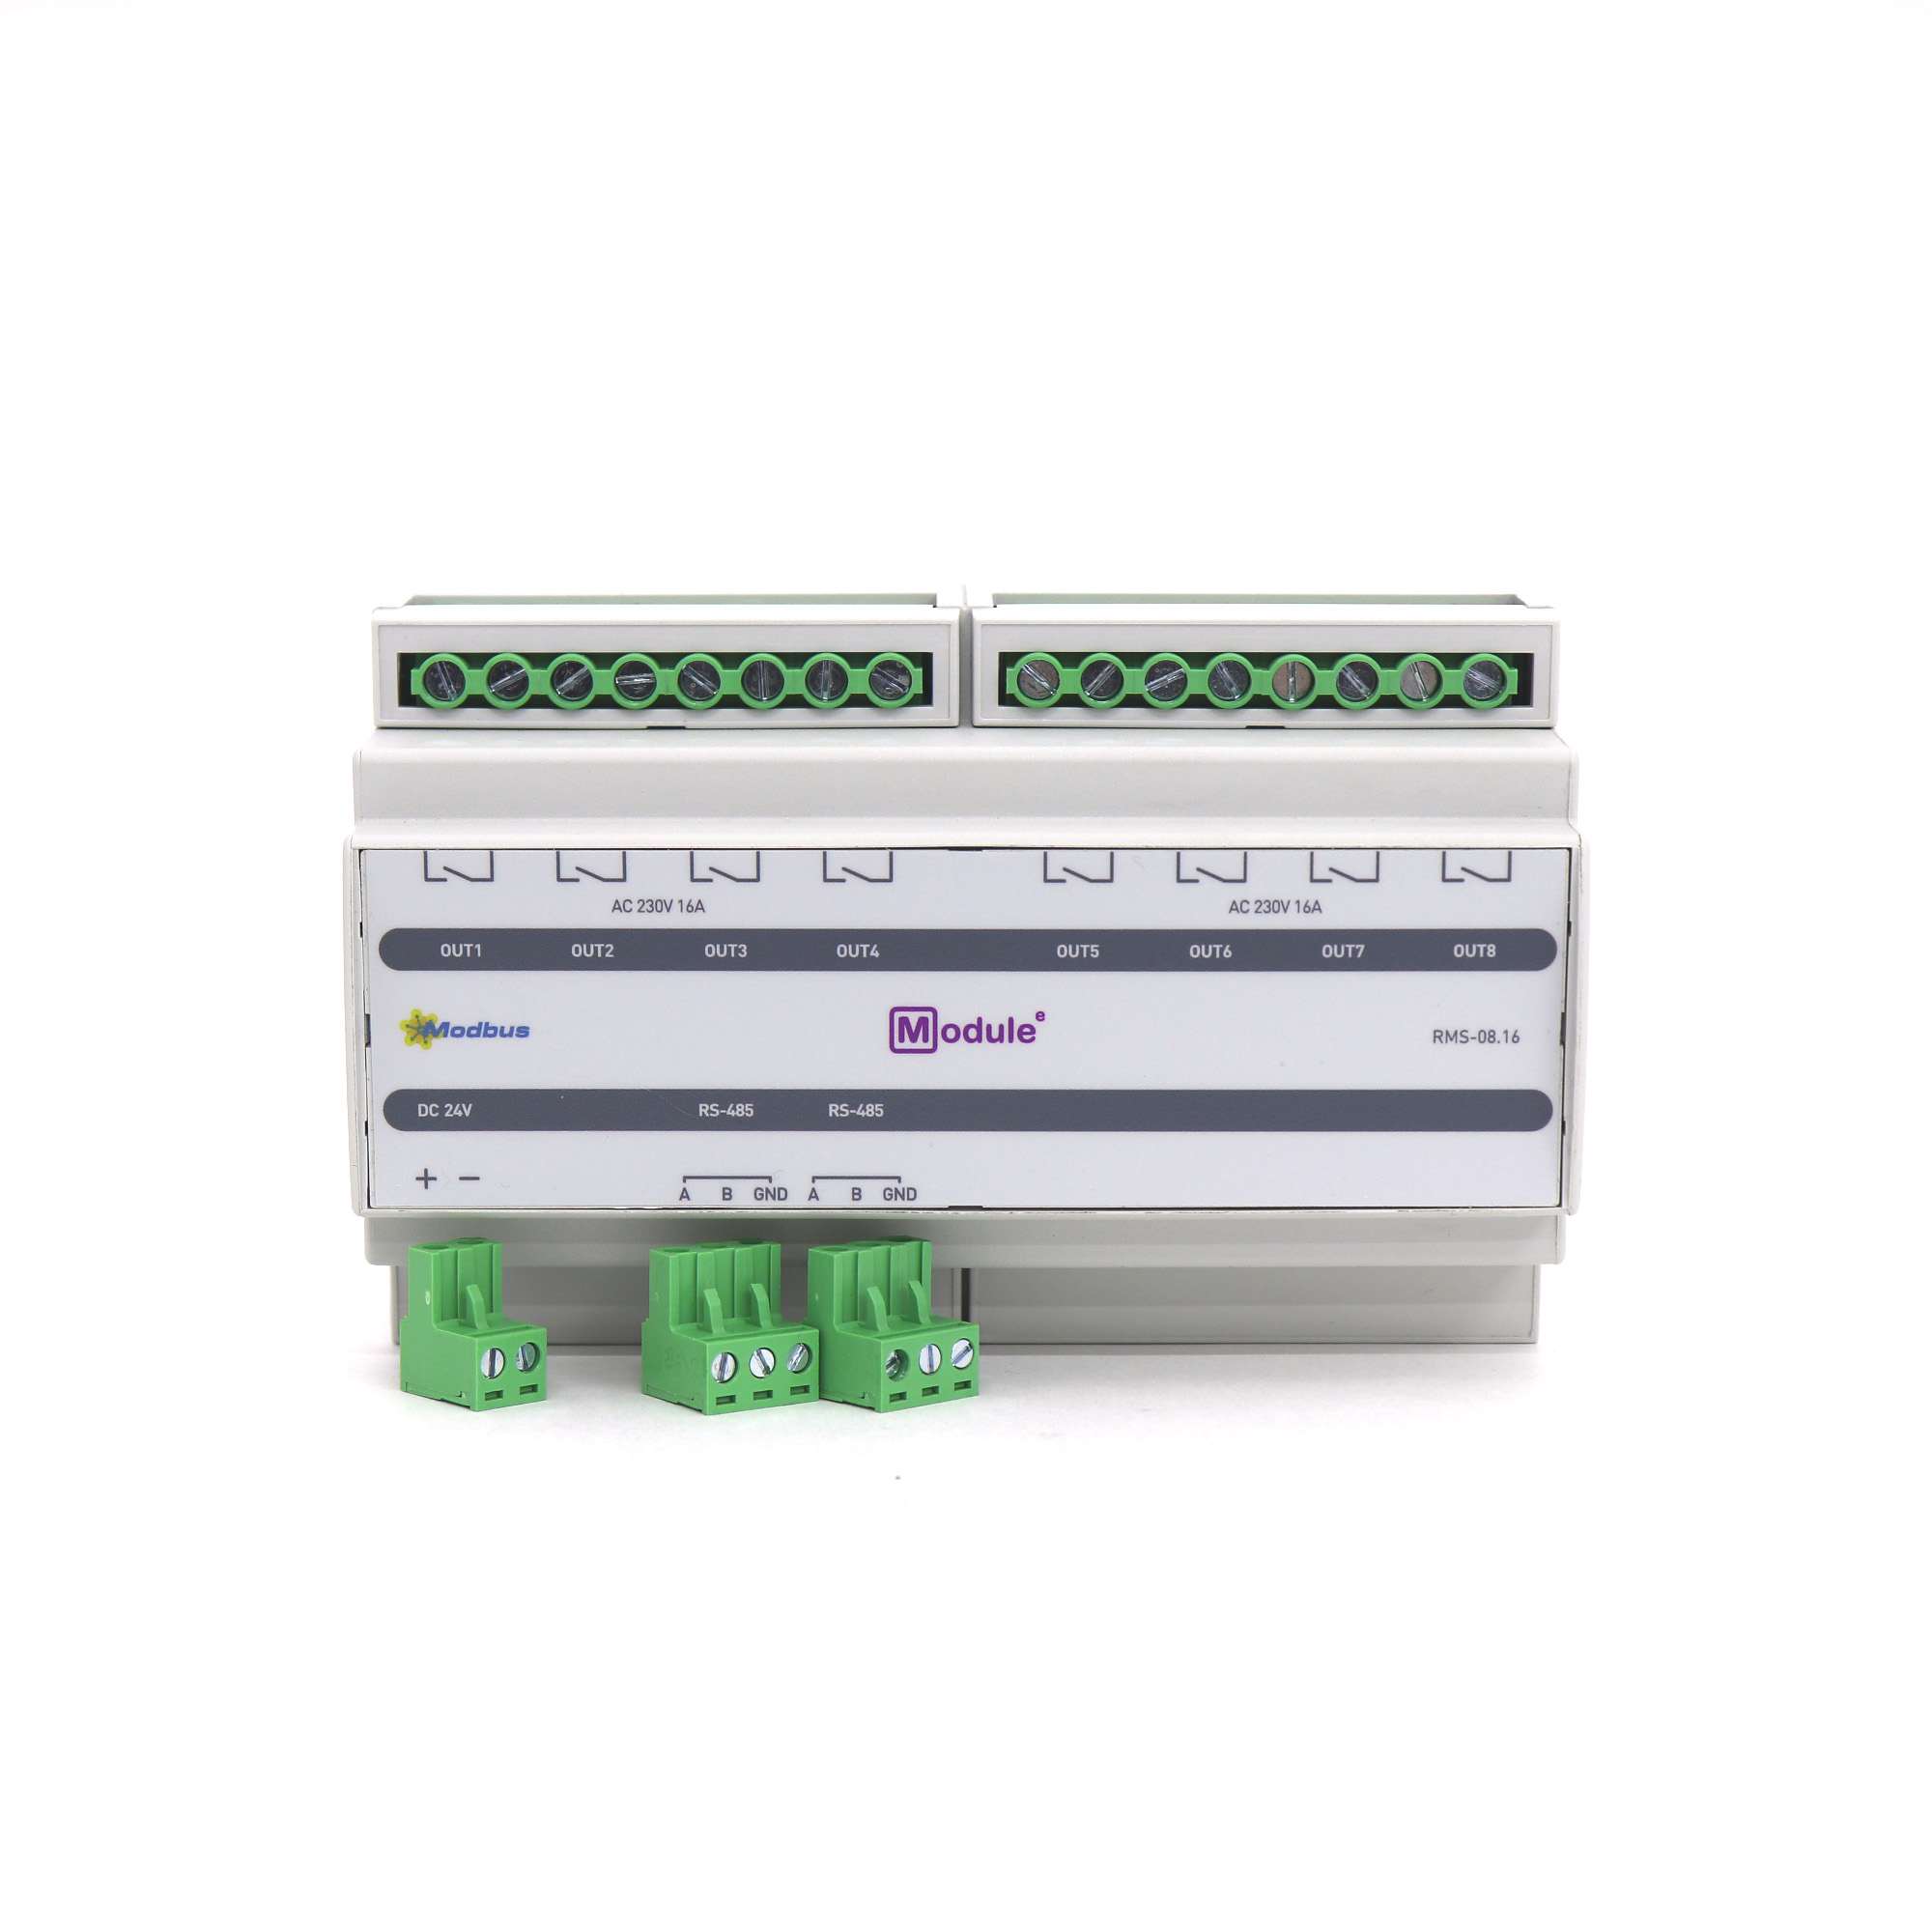 RMS-08.16, Modbus модуль дискретного вывода, 8 каналов 16А